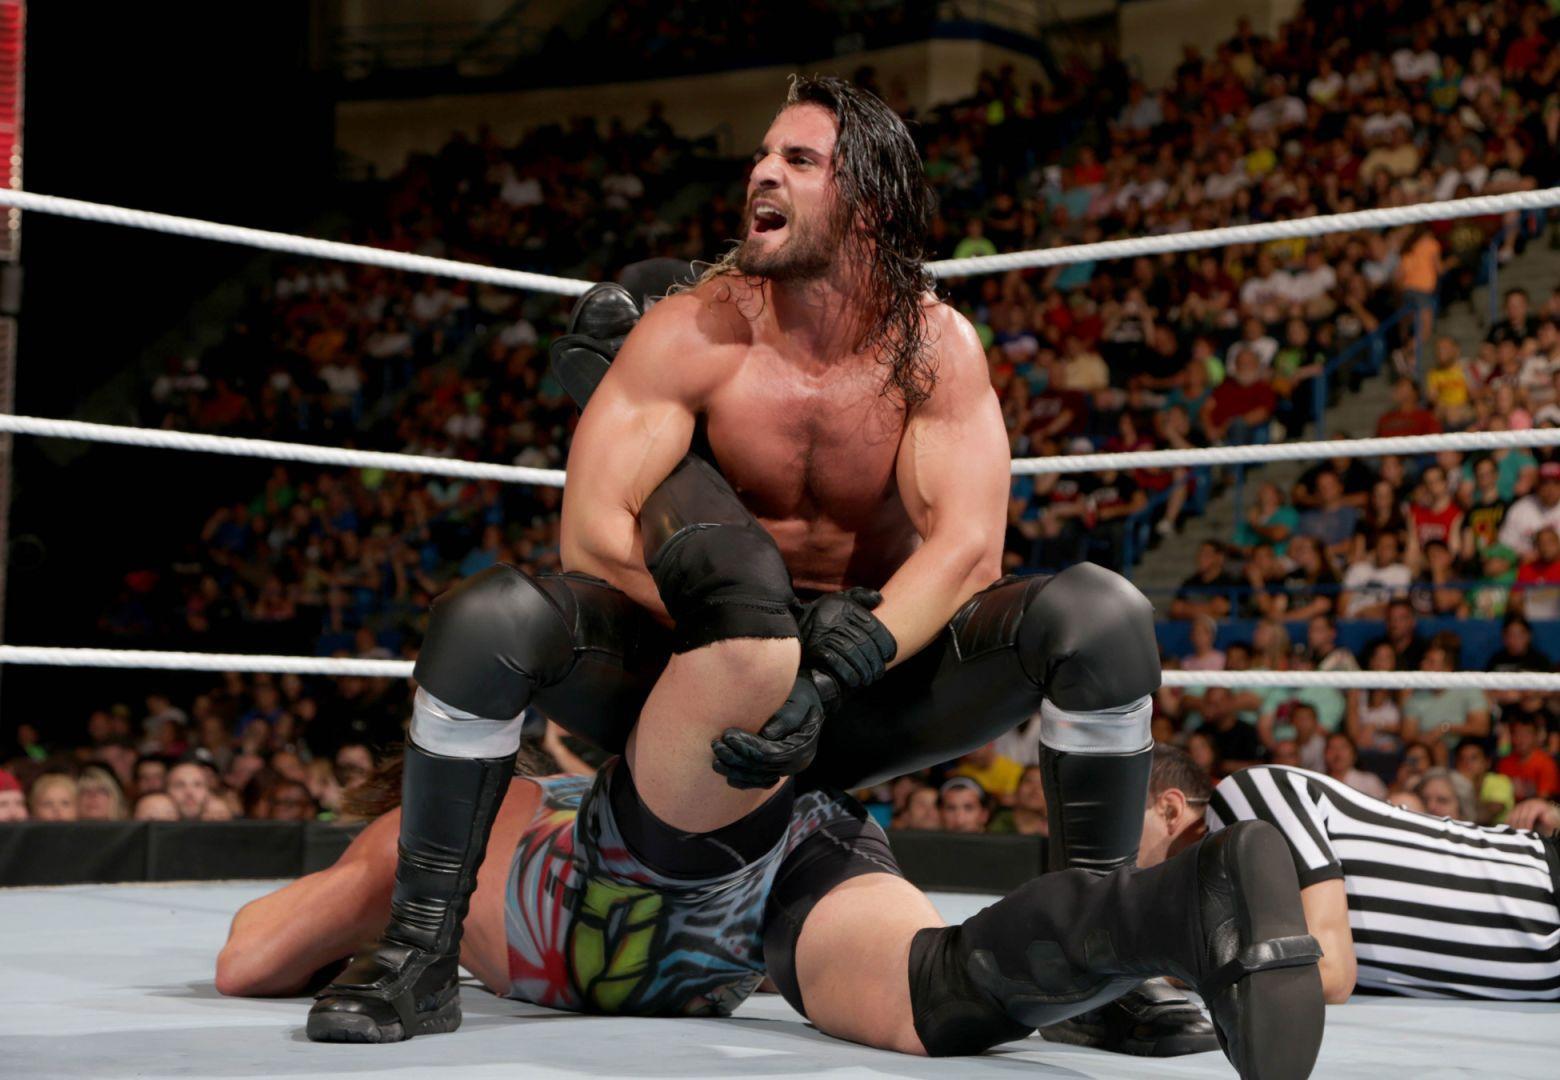 Friday nite wrestle twenty one muscle beef wrestling